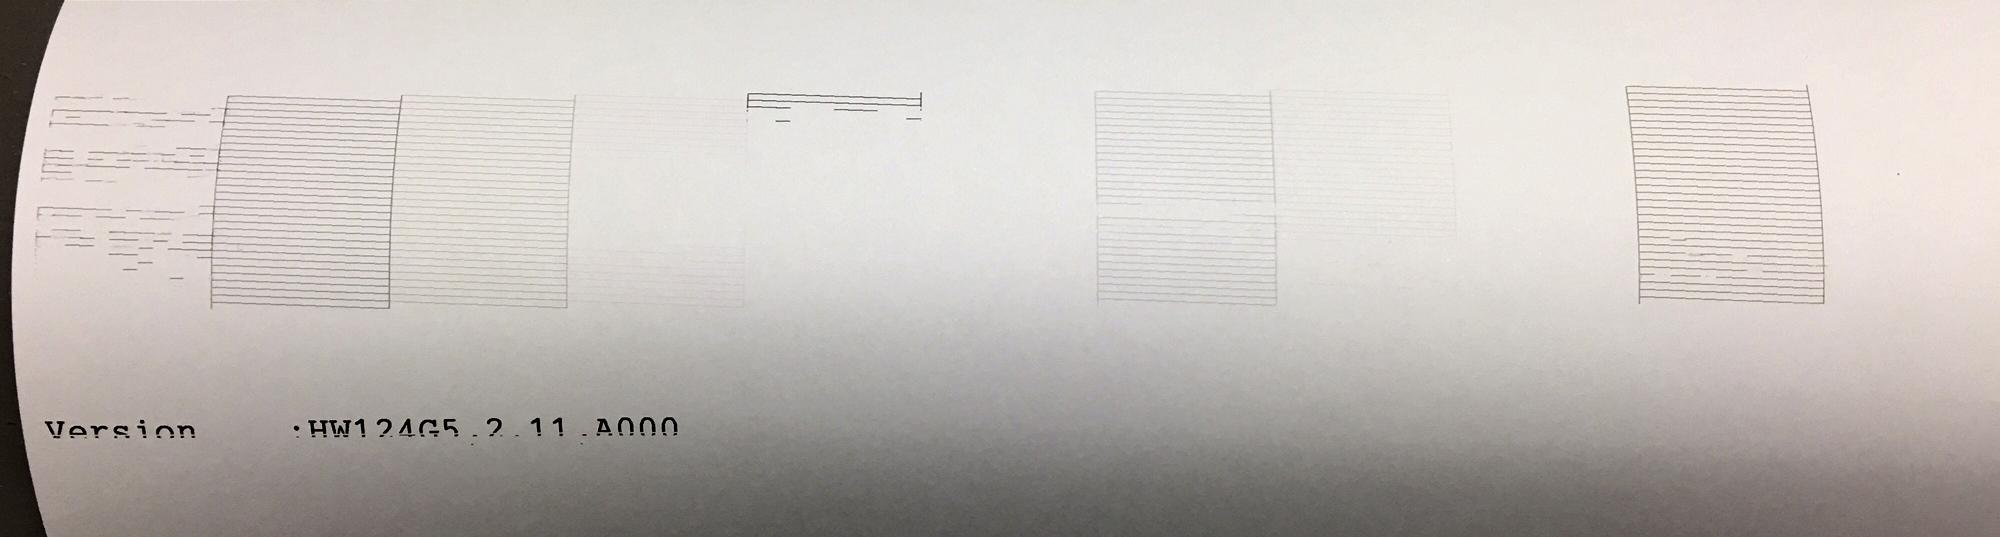 Epson 9900 head clogs with new PiezoPro inks - Piezography